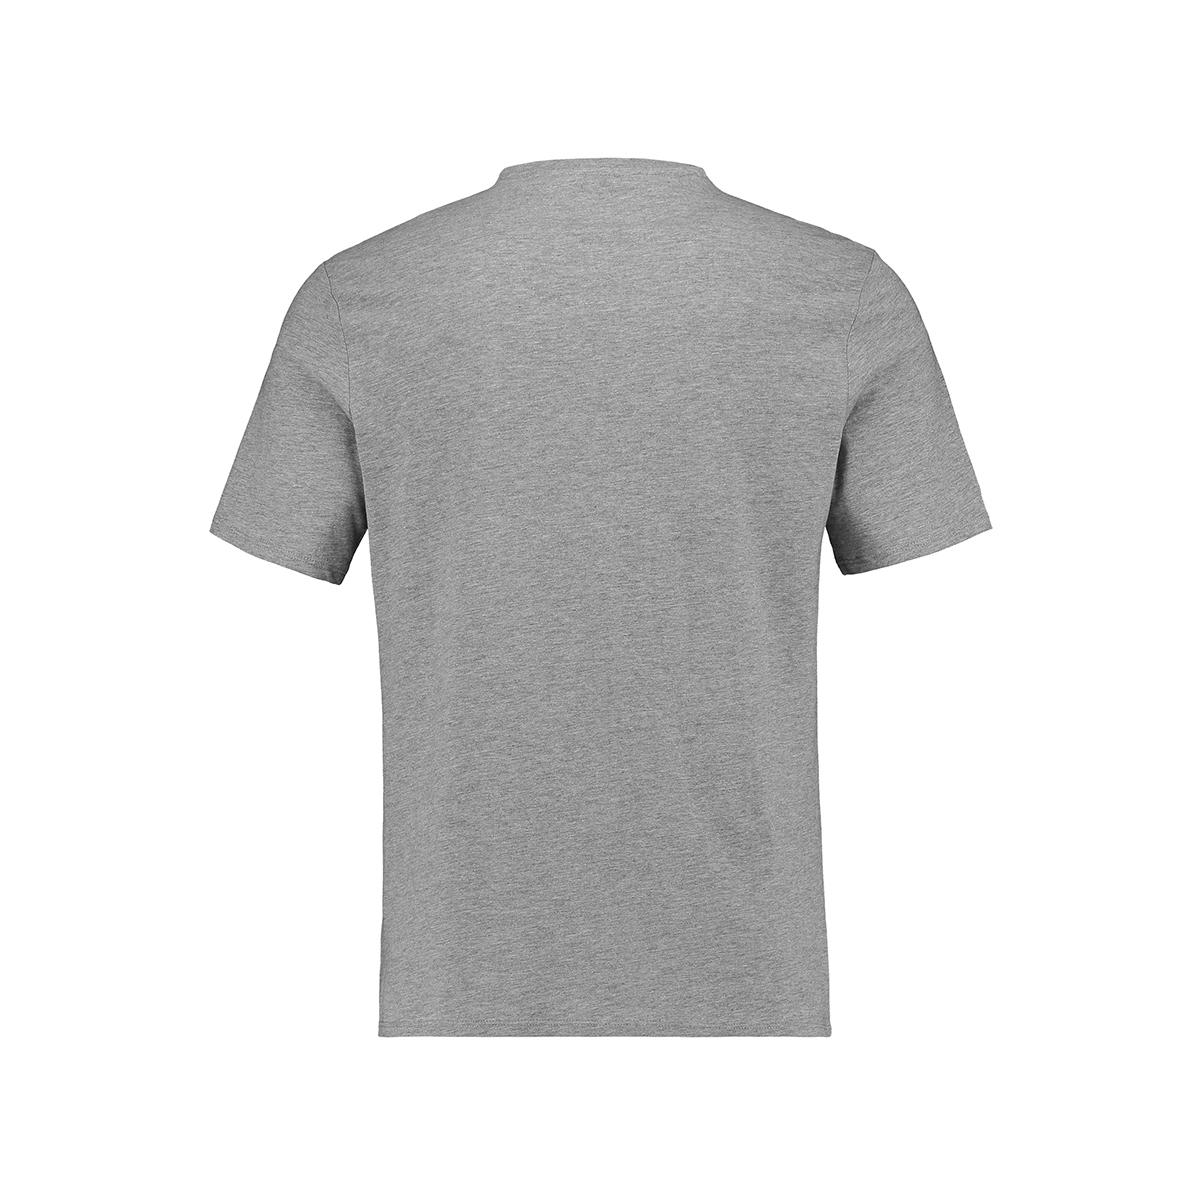 lm ocotillo t shirt 0a2302 o`neill t-shirt 8001 silver melee